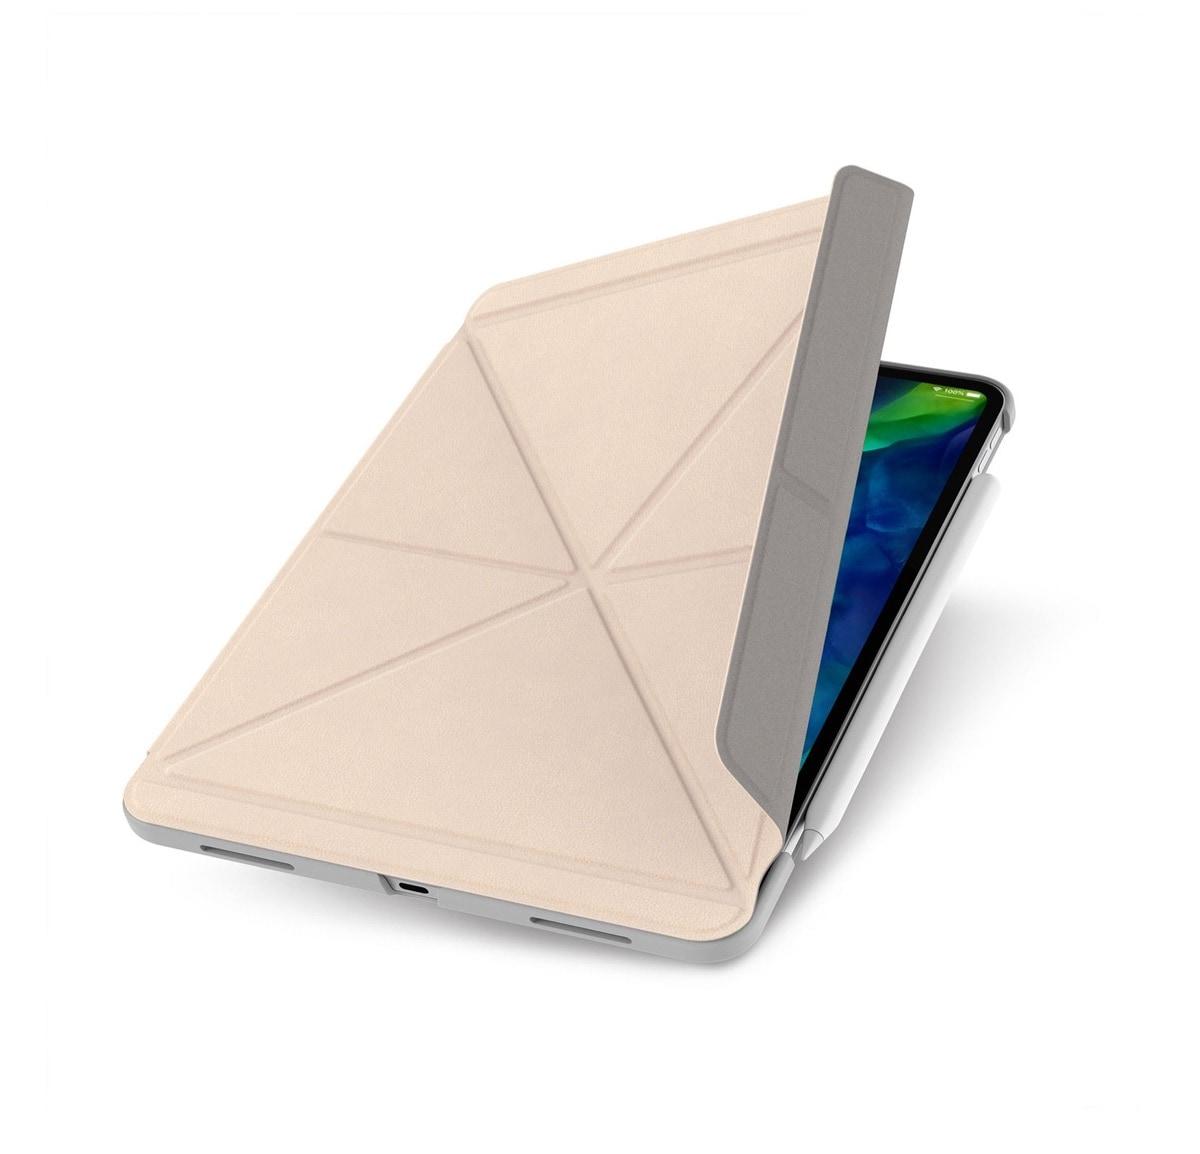 Moshi origami style iPad Pro 11 case cover